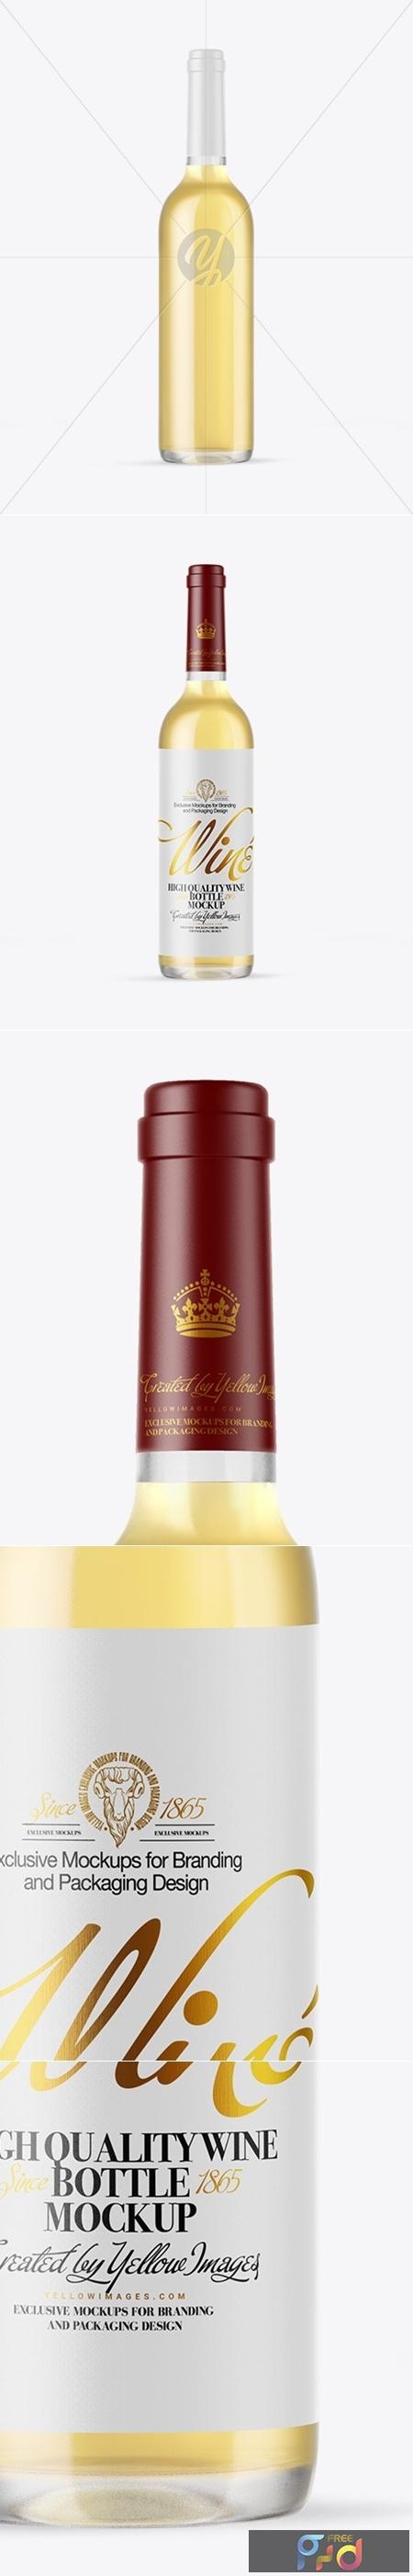 Clear Glass White Wine Bottle Mockup 50489 1